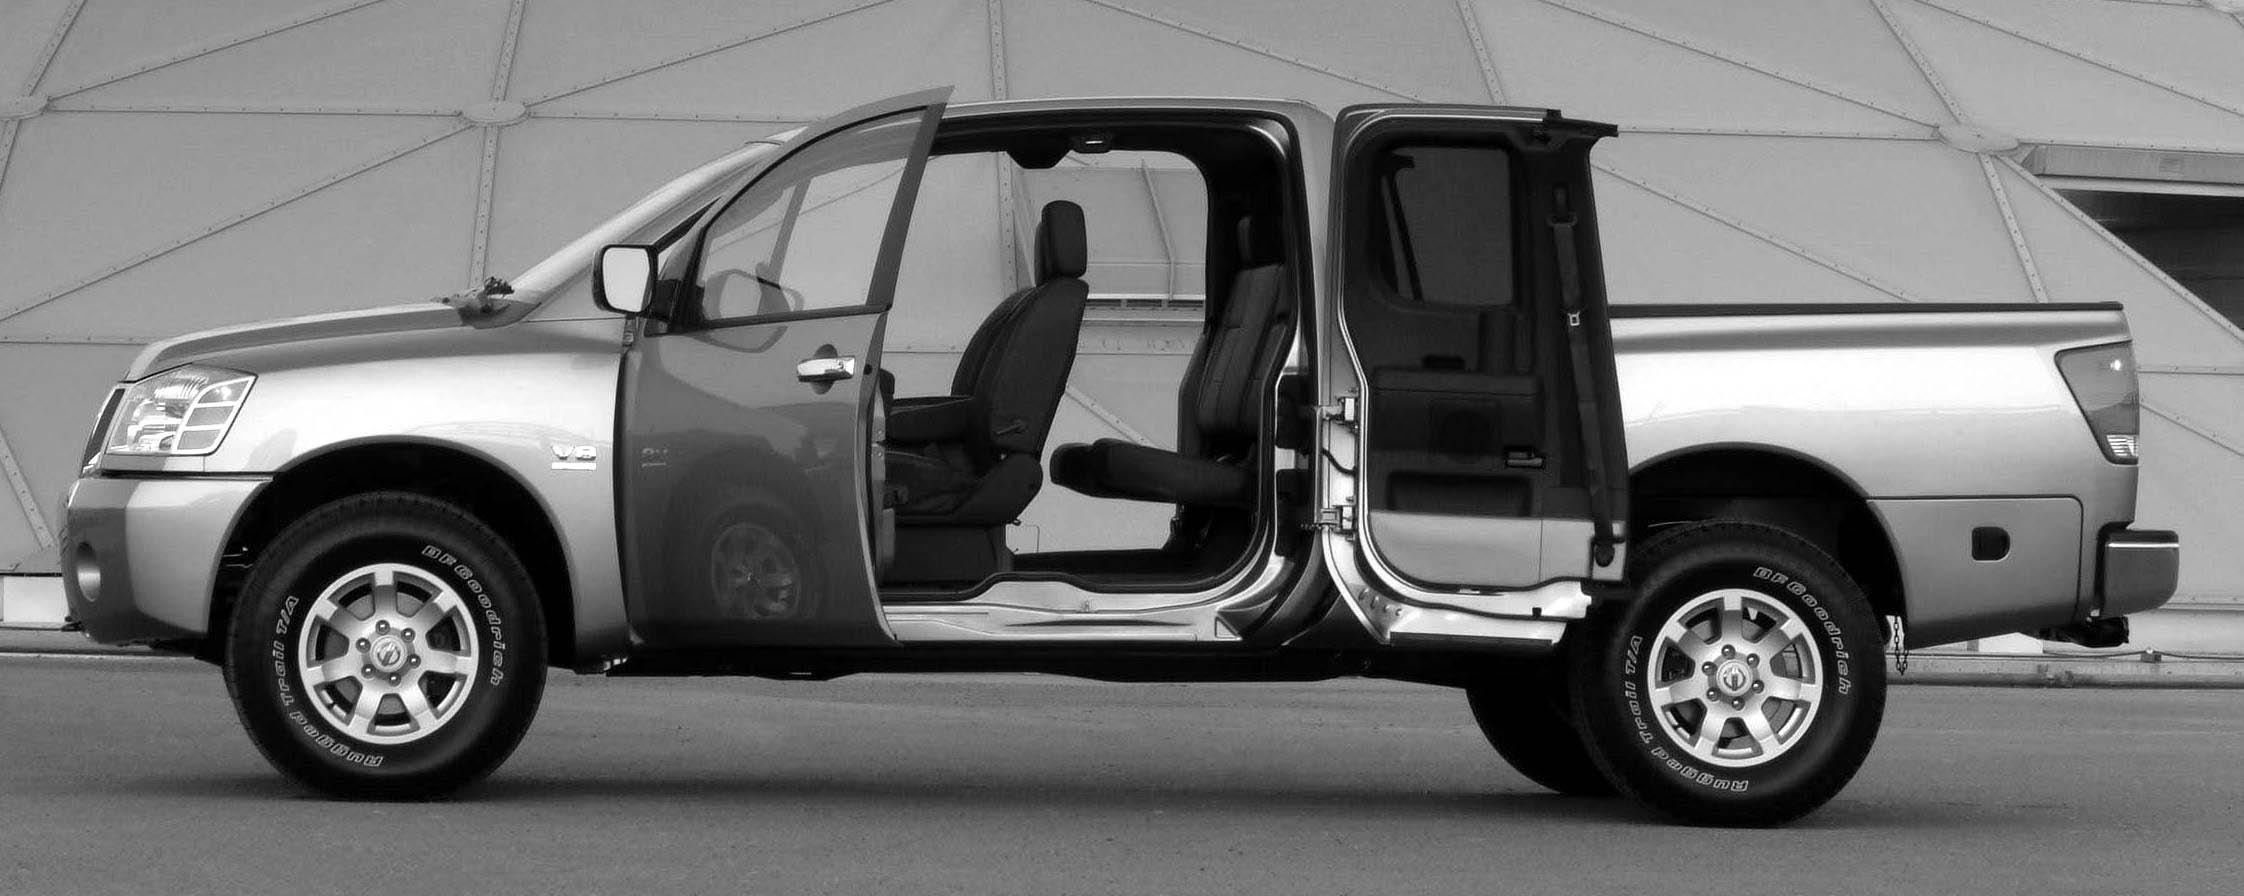 2005 Nissan Titan 4x4 SE King Cab